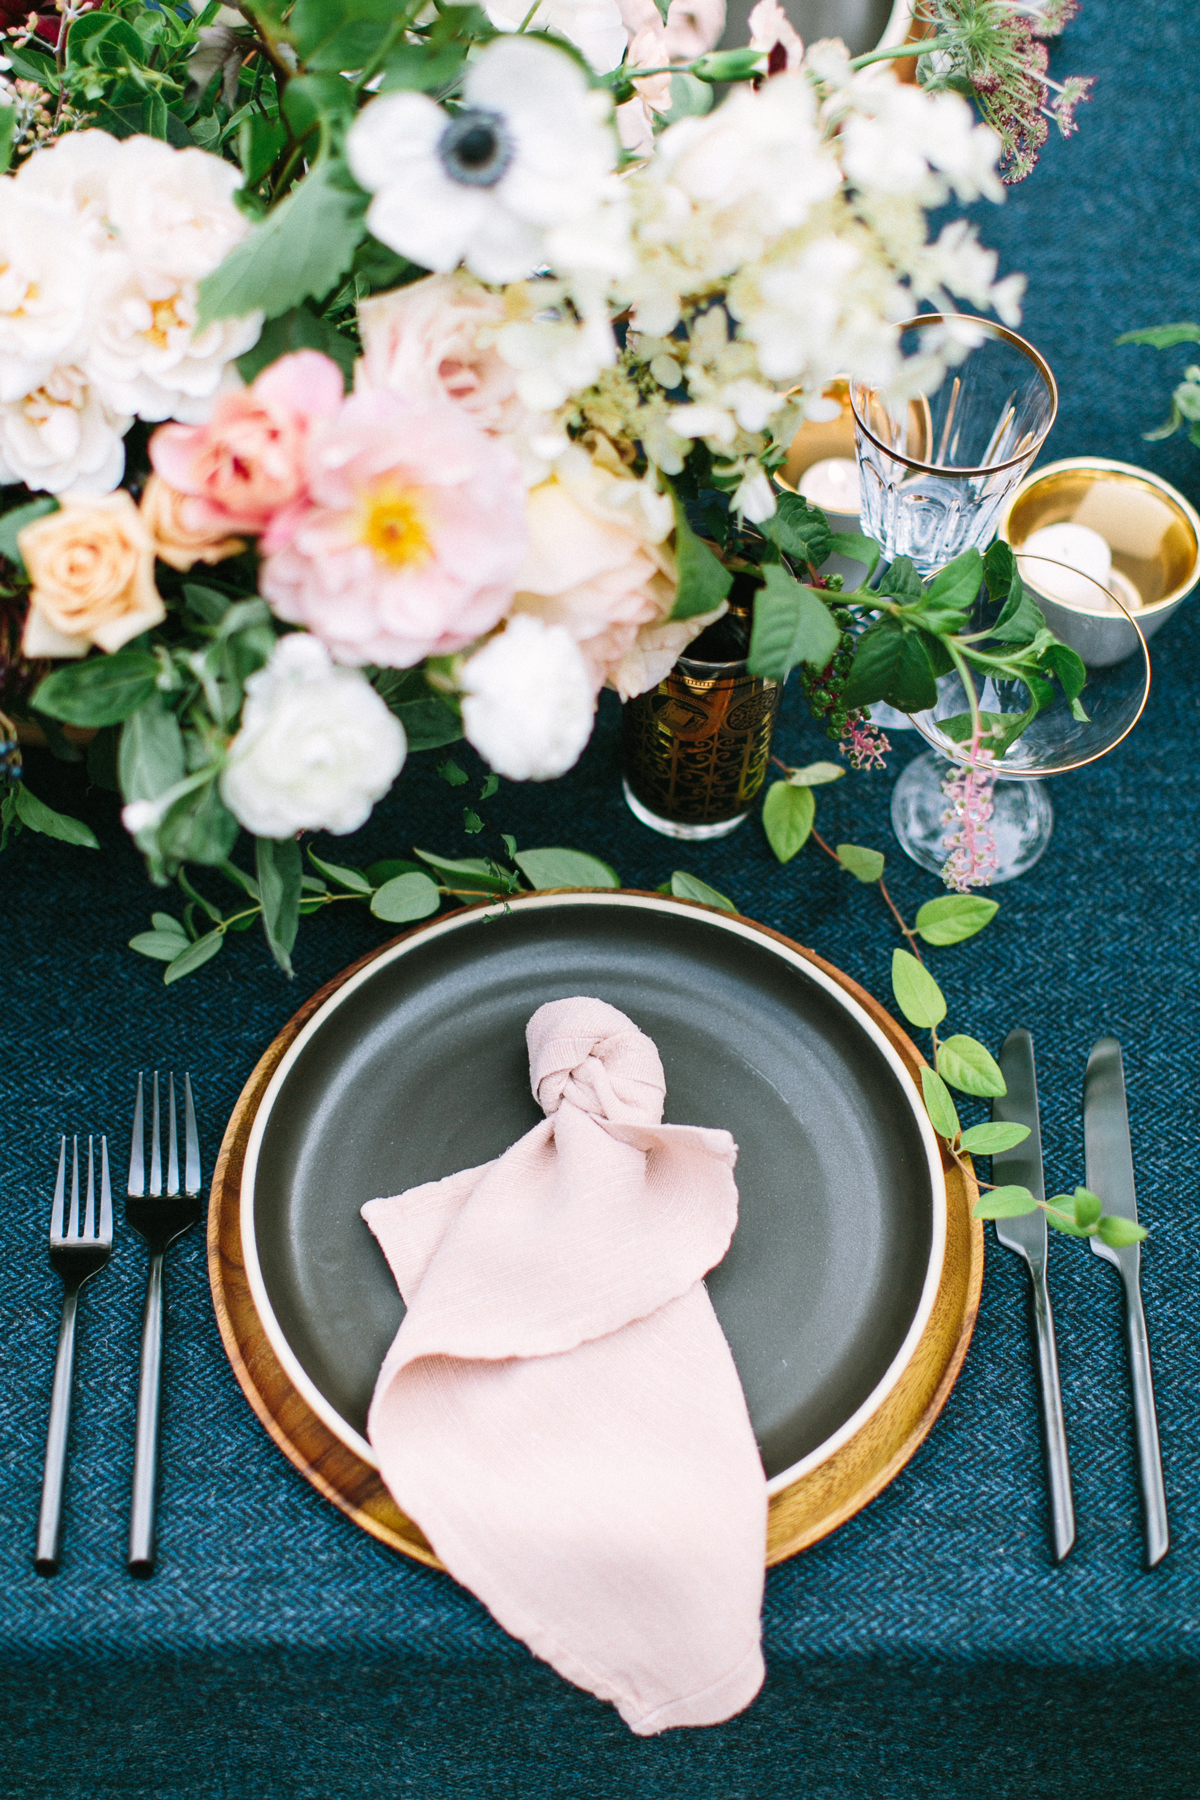 wedding reception napkin folds pink napkin in a knot